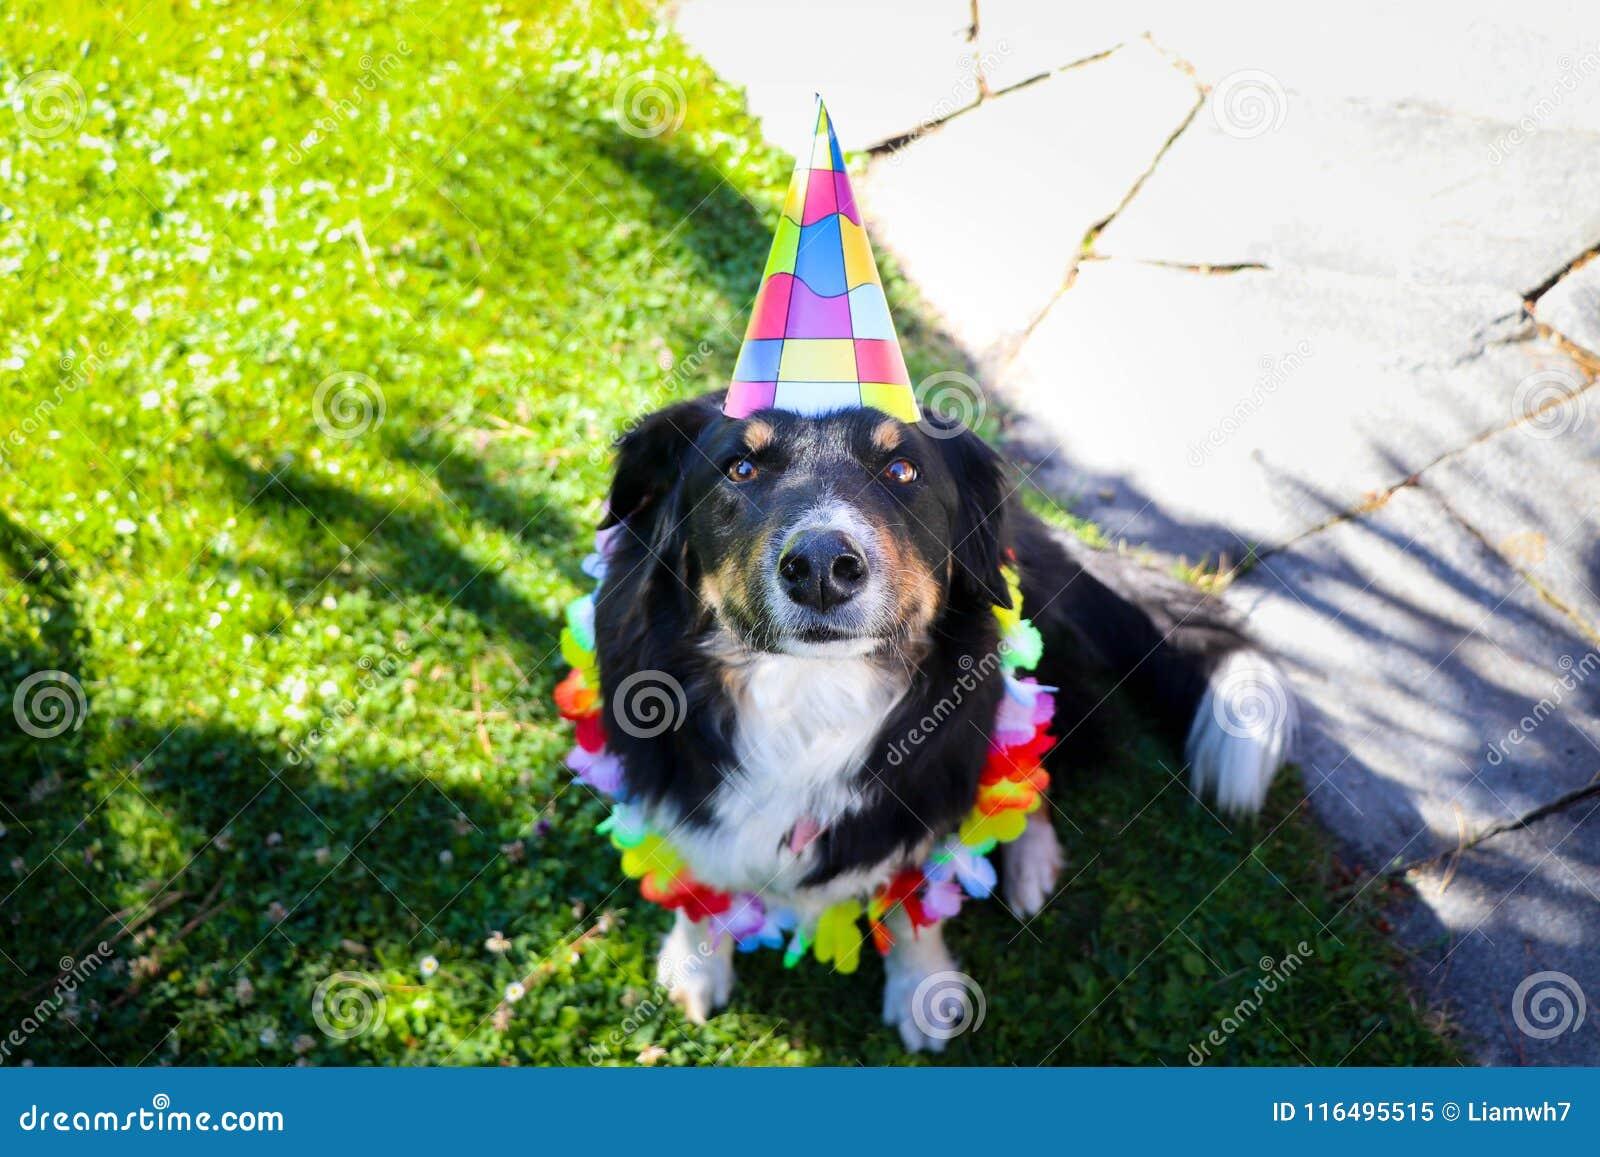 Puppy Dog Border collie Happy birthday celebration hat party